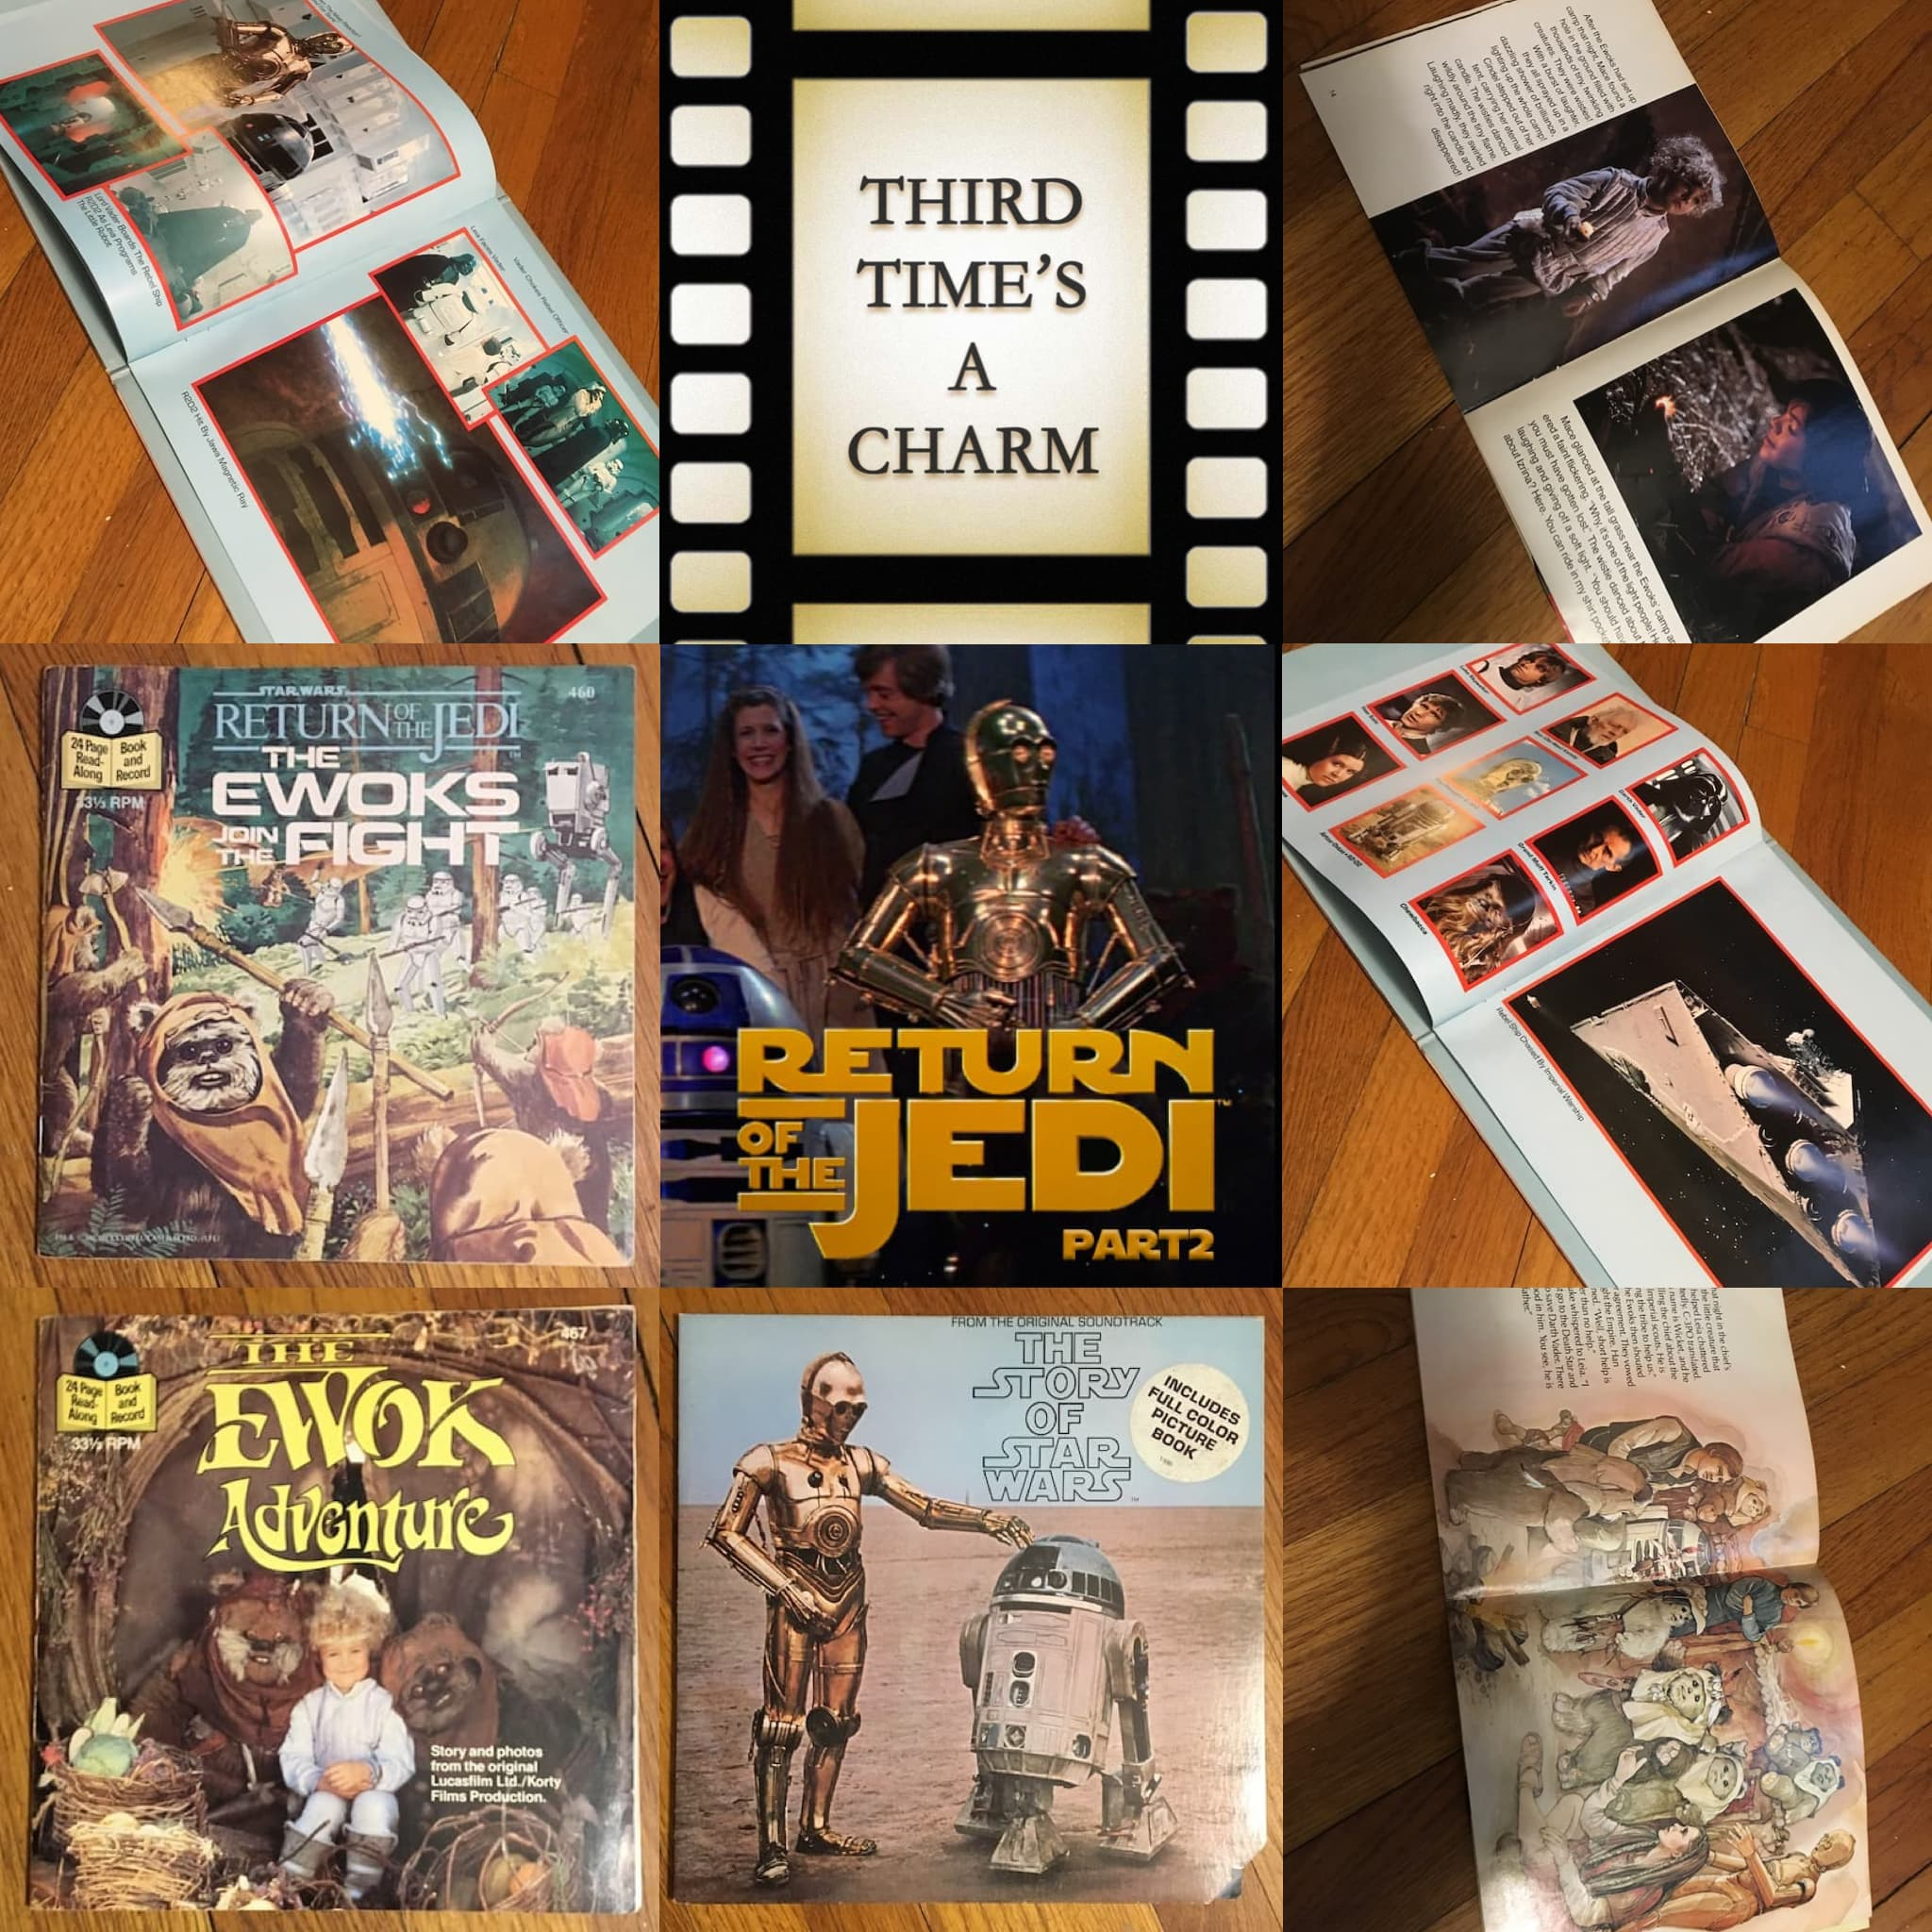 Star Wars: Episode VI - Return of the Jedi (1983): Part 2